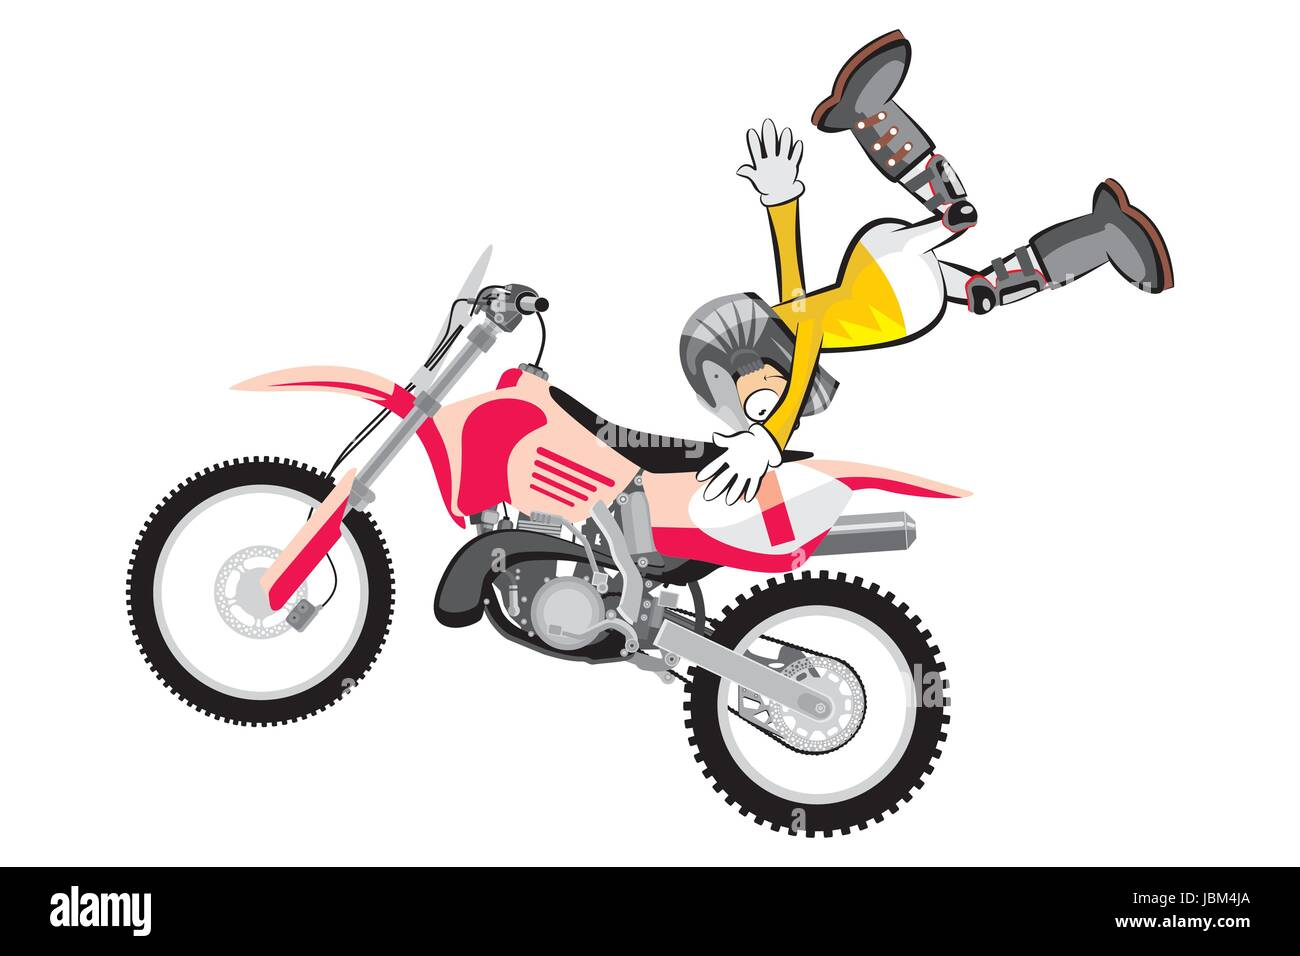 Motocross Rider Isolated Over White Backgrorund Cartoon Style Stock Vector Image Art Alamy